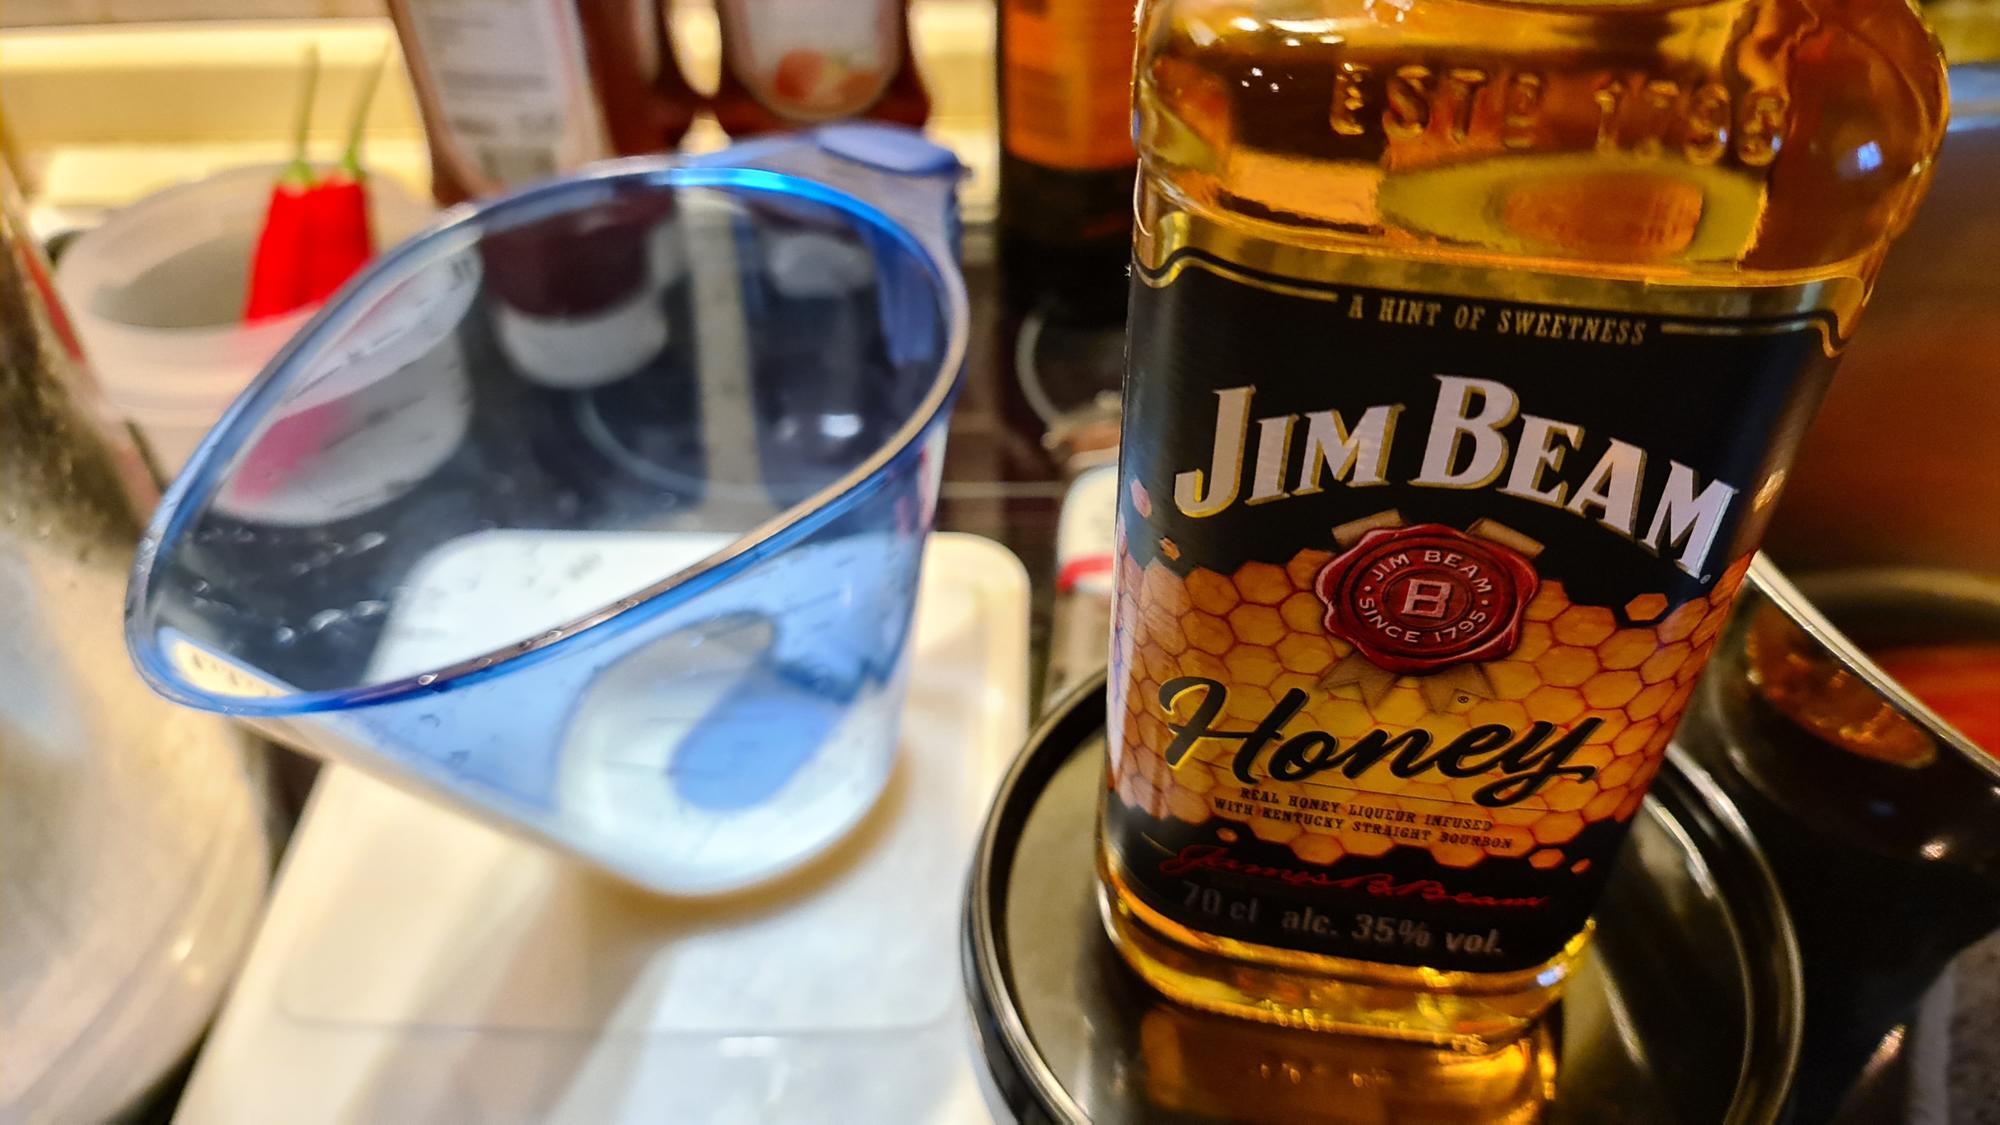 04 - Der Whiskey.png